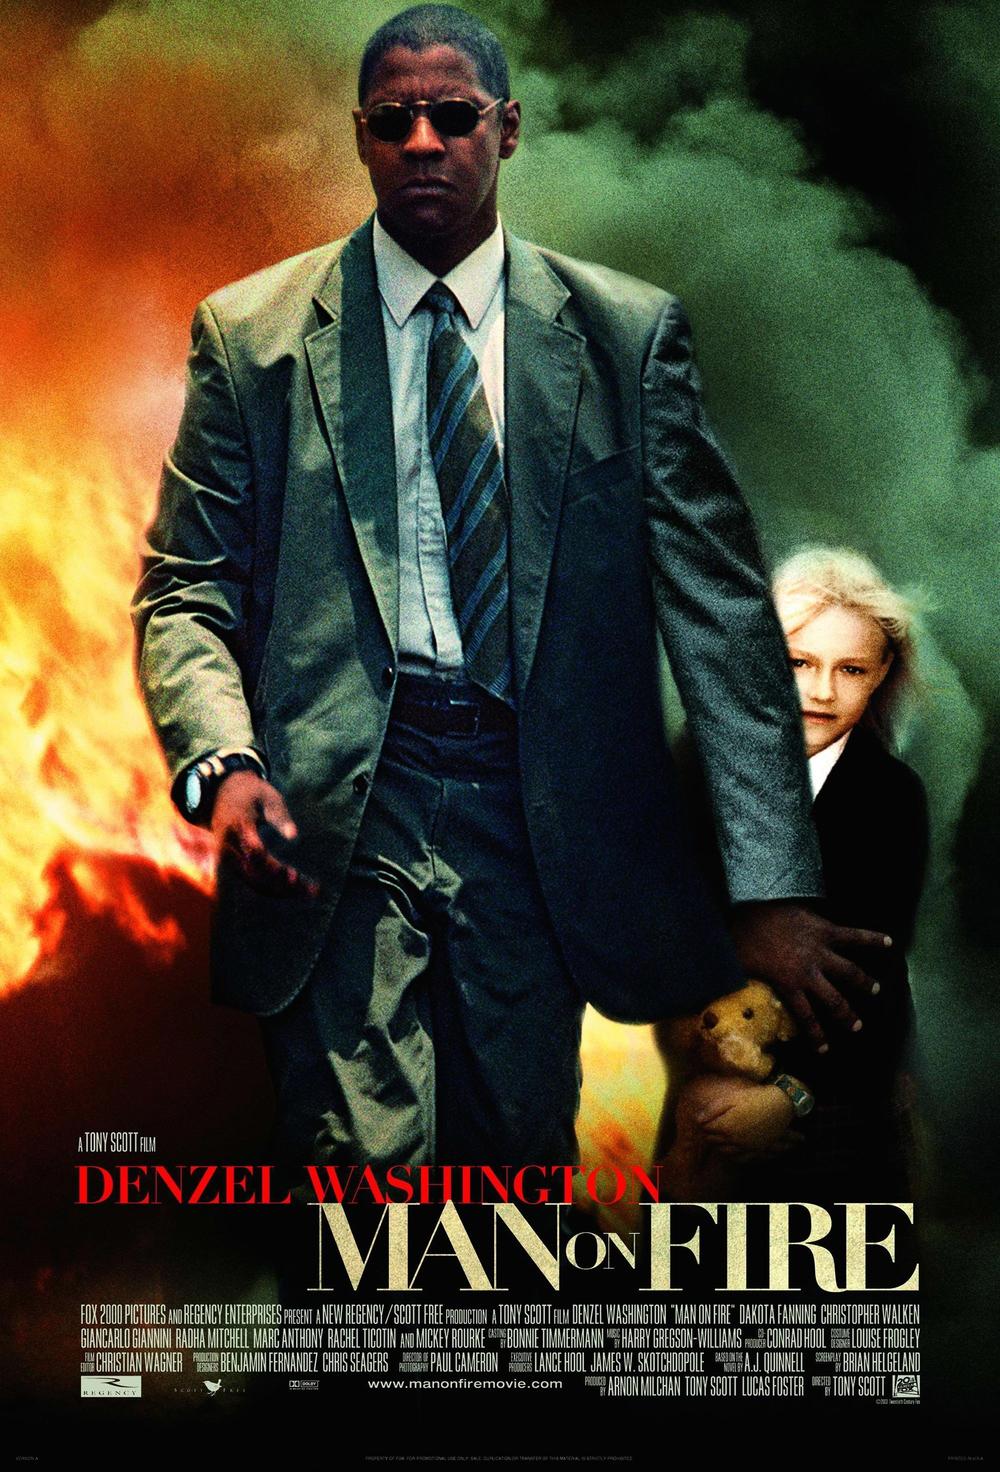 2004-Man On Fire.jpg